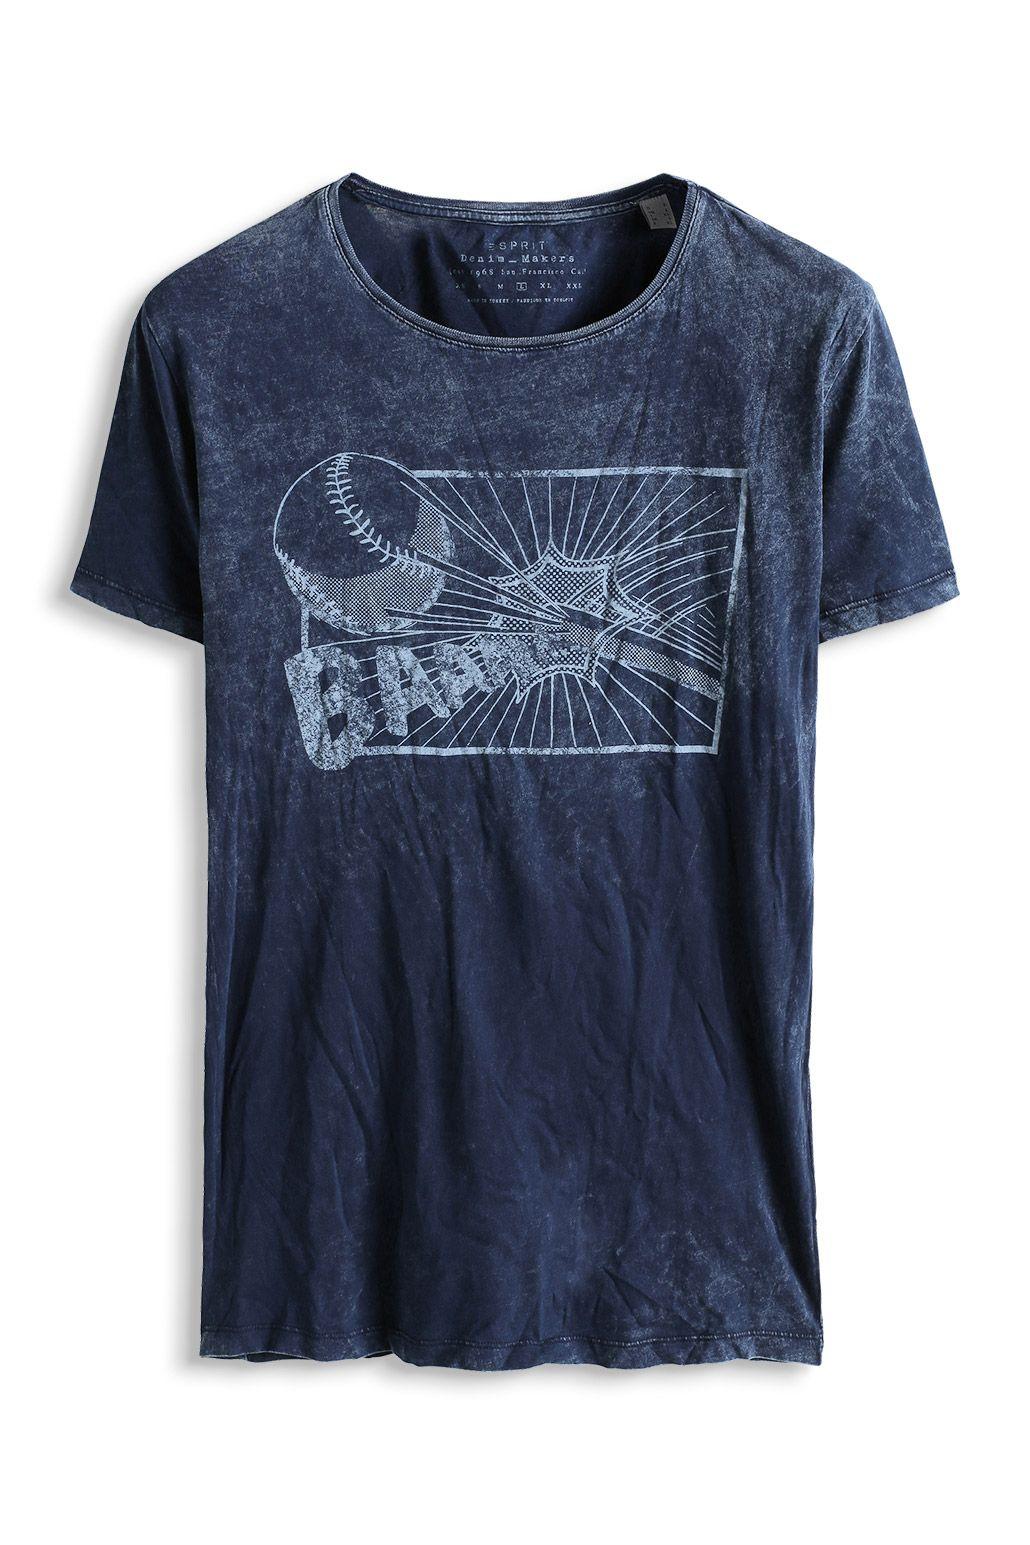 for esprit baumwoll jersey print t shirt im online shop kaufen t shirt. Black Bedroom Furniture Sets. Home Design Ideas